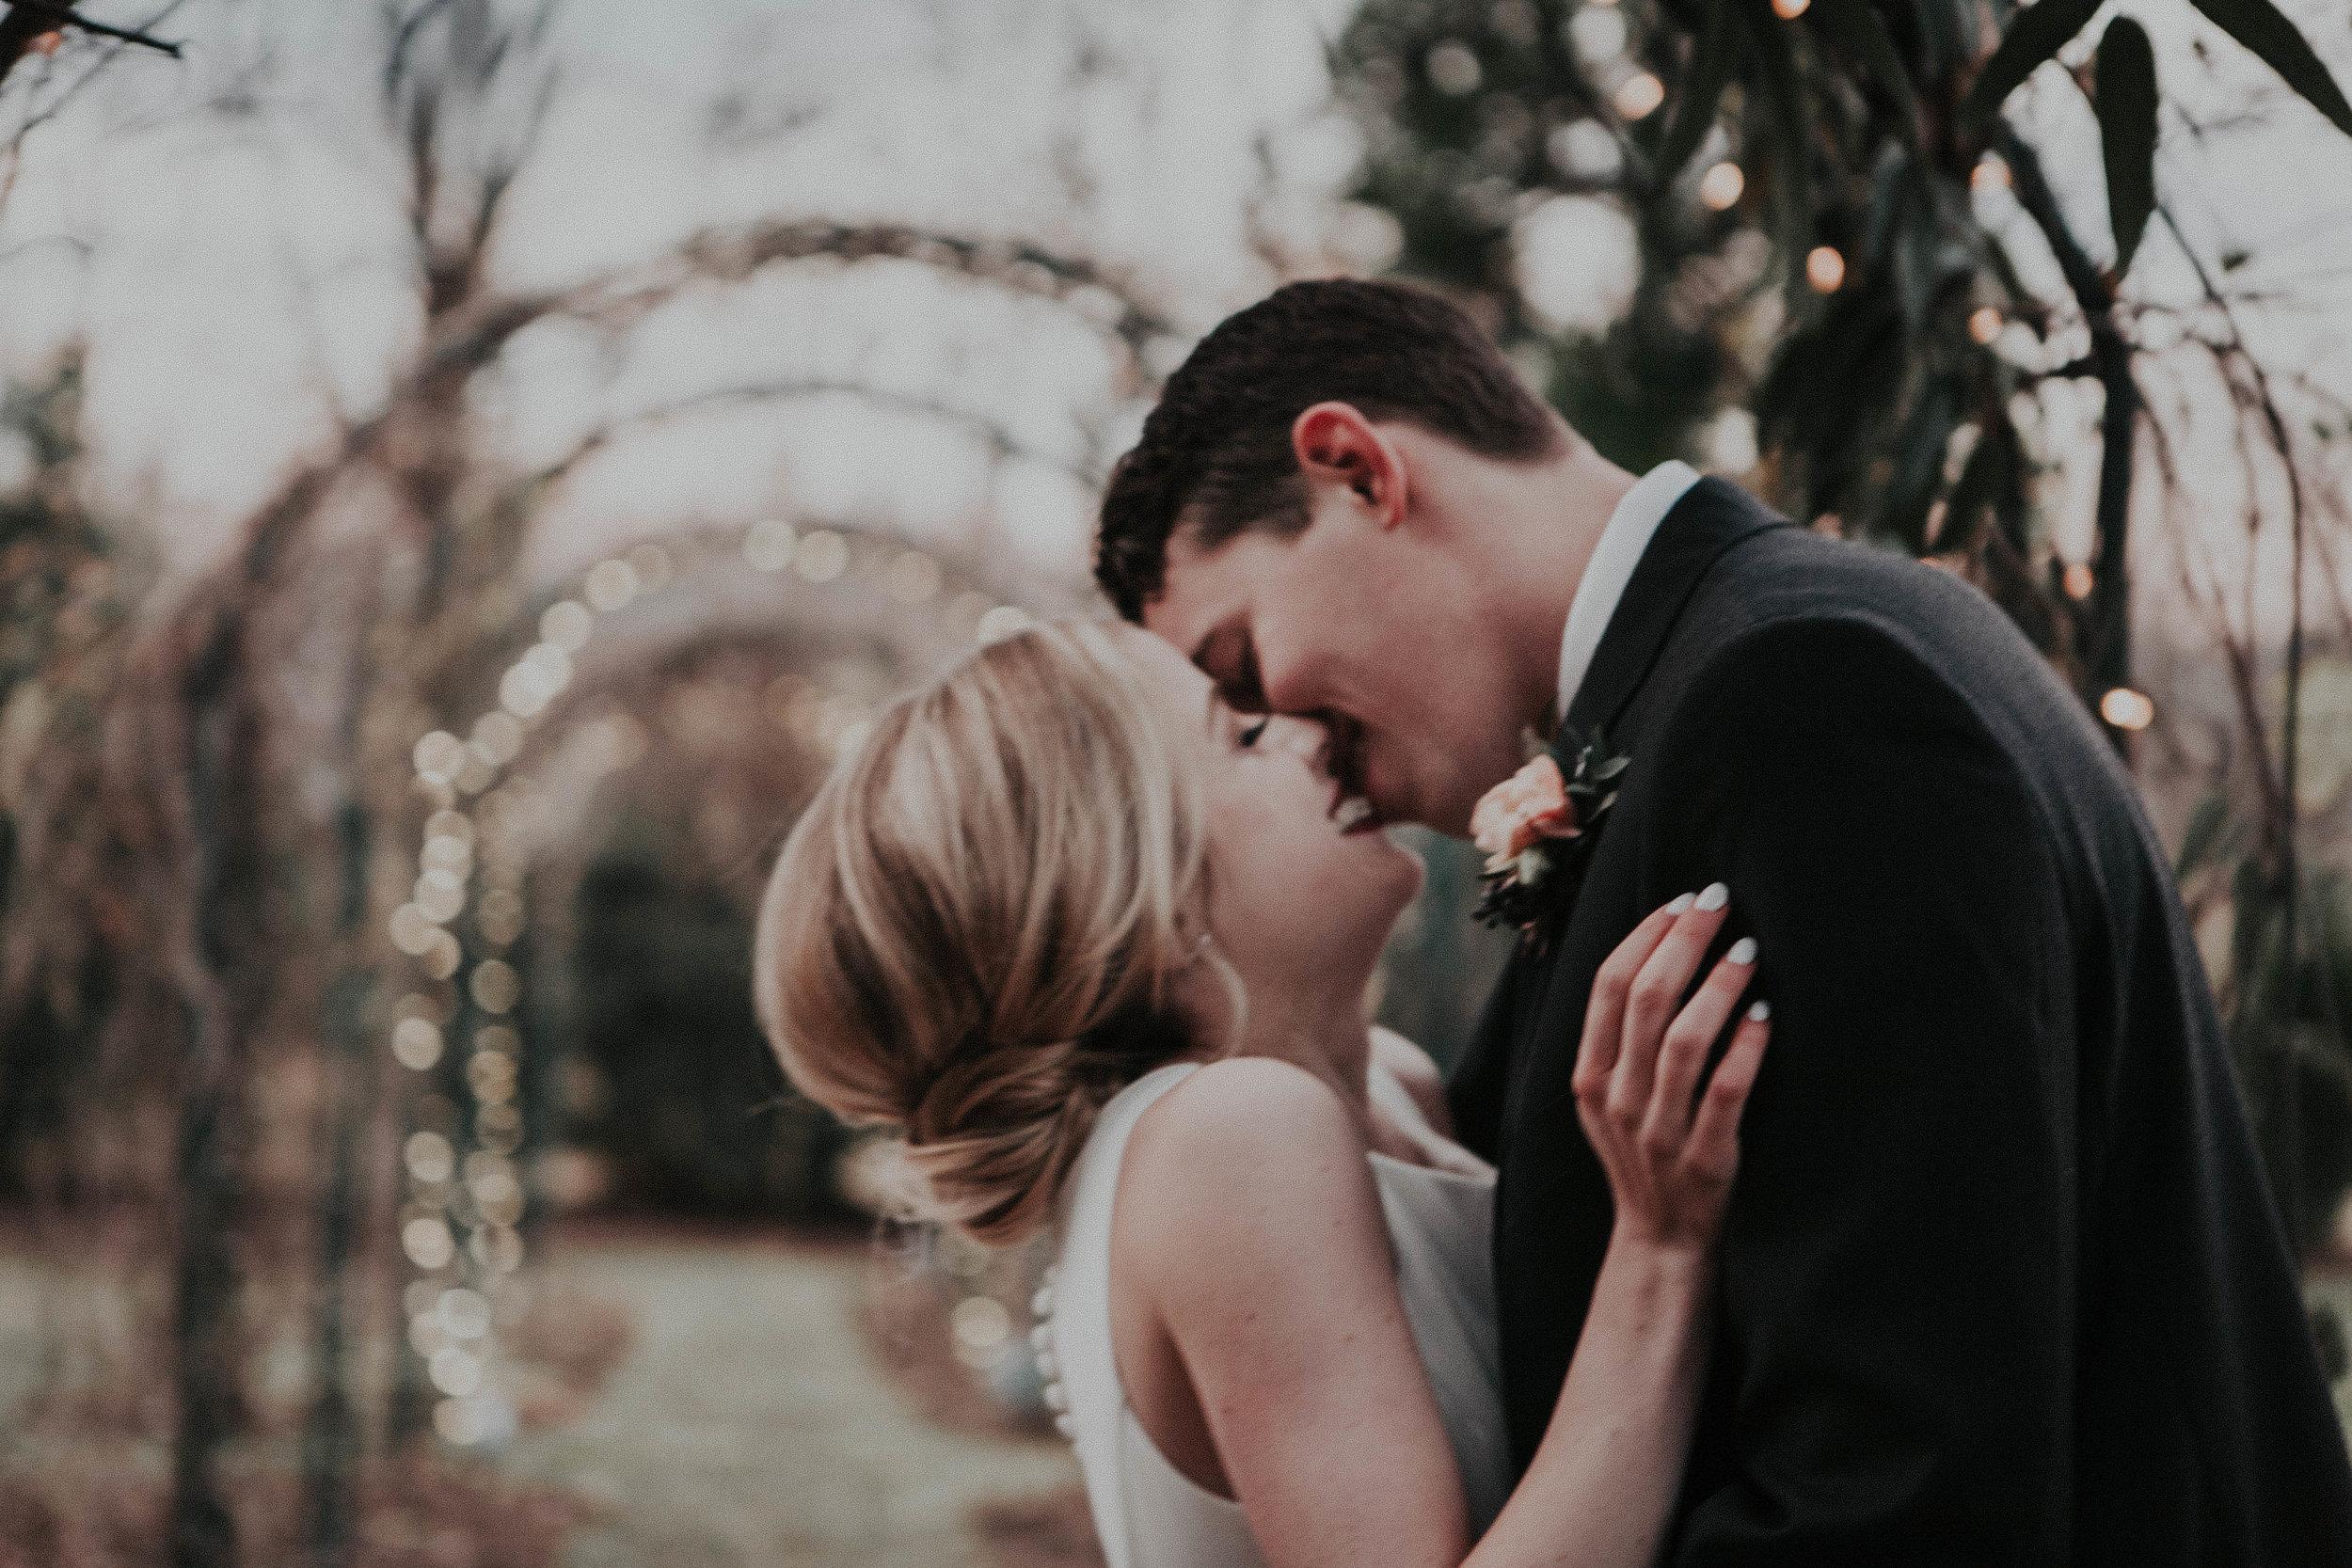 Charis_Lauren_Romantic_Wedding_Photographer_Nashville_01259-2.jpg